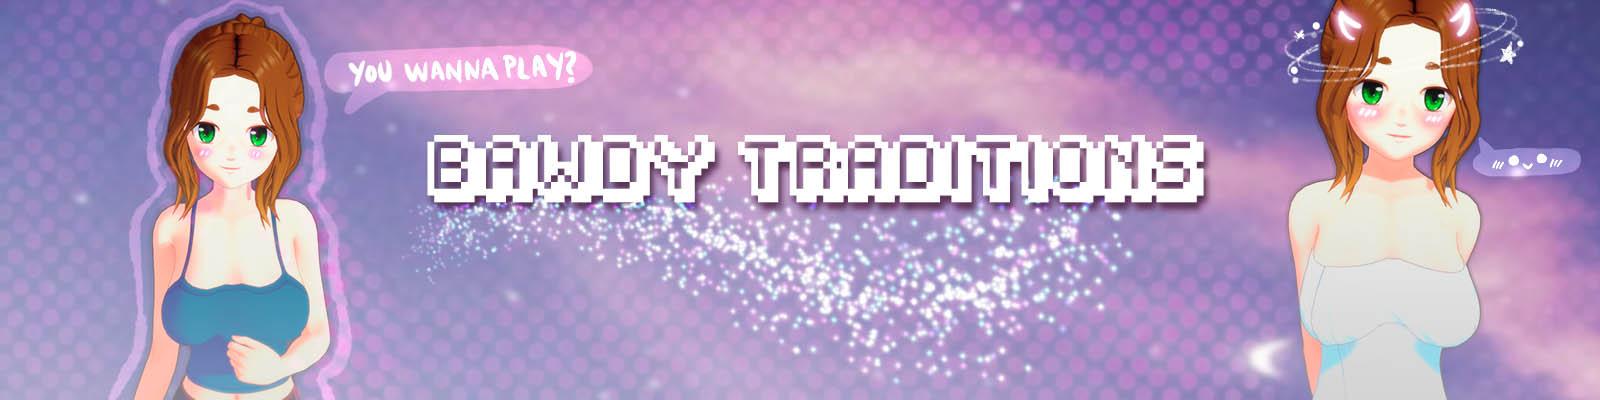 Bawdy Traditions (v0.7.4)